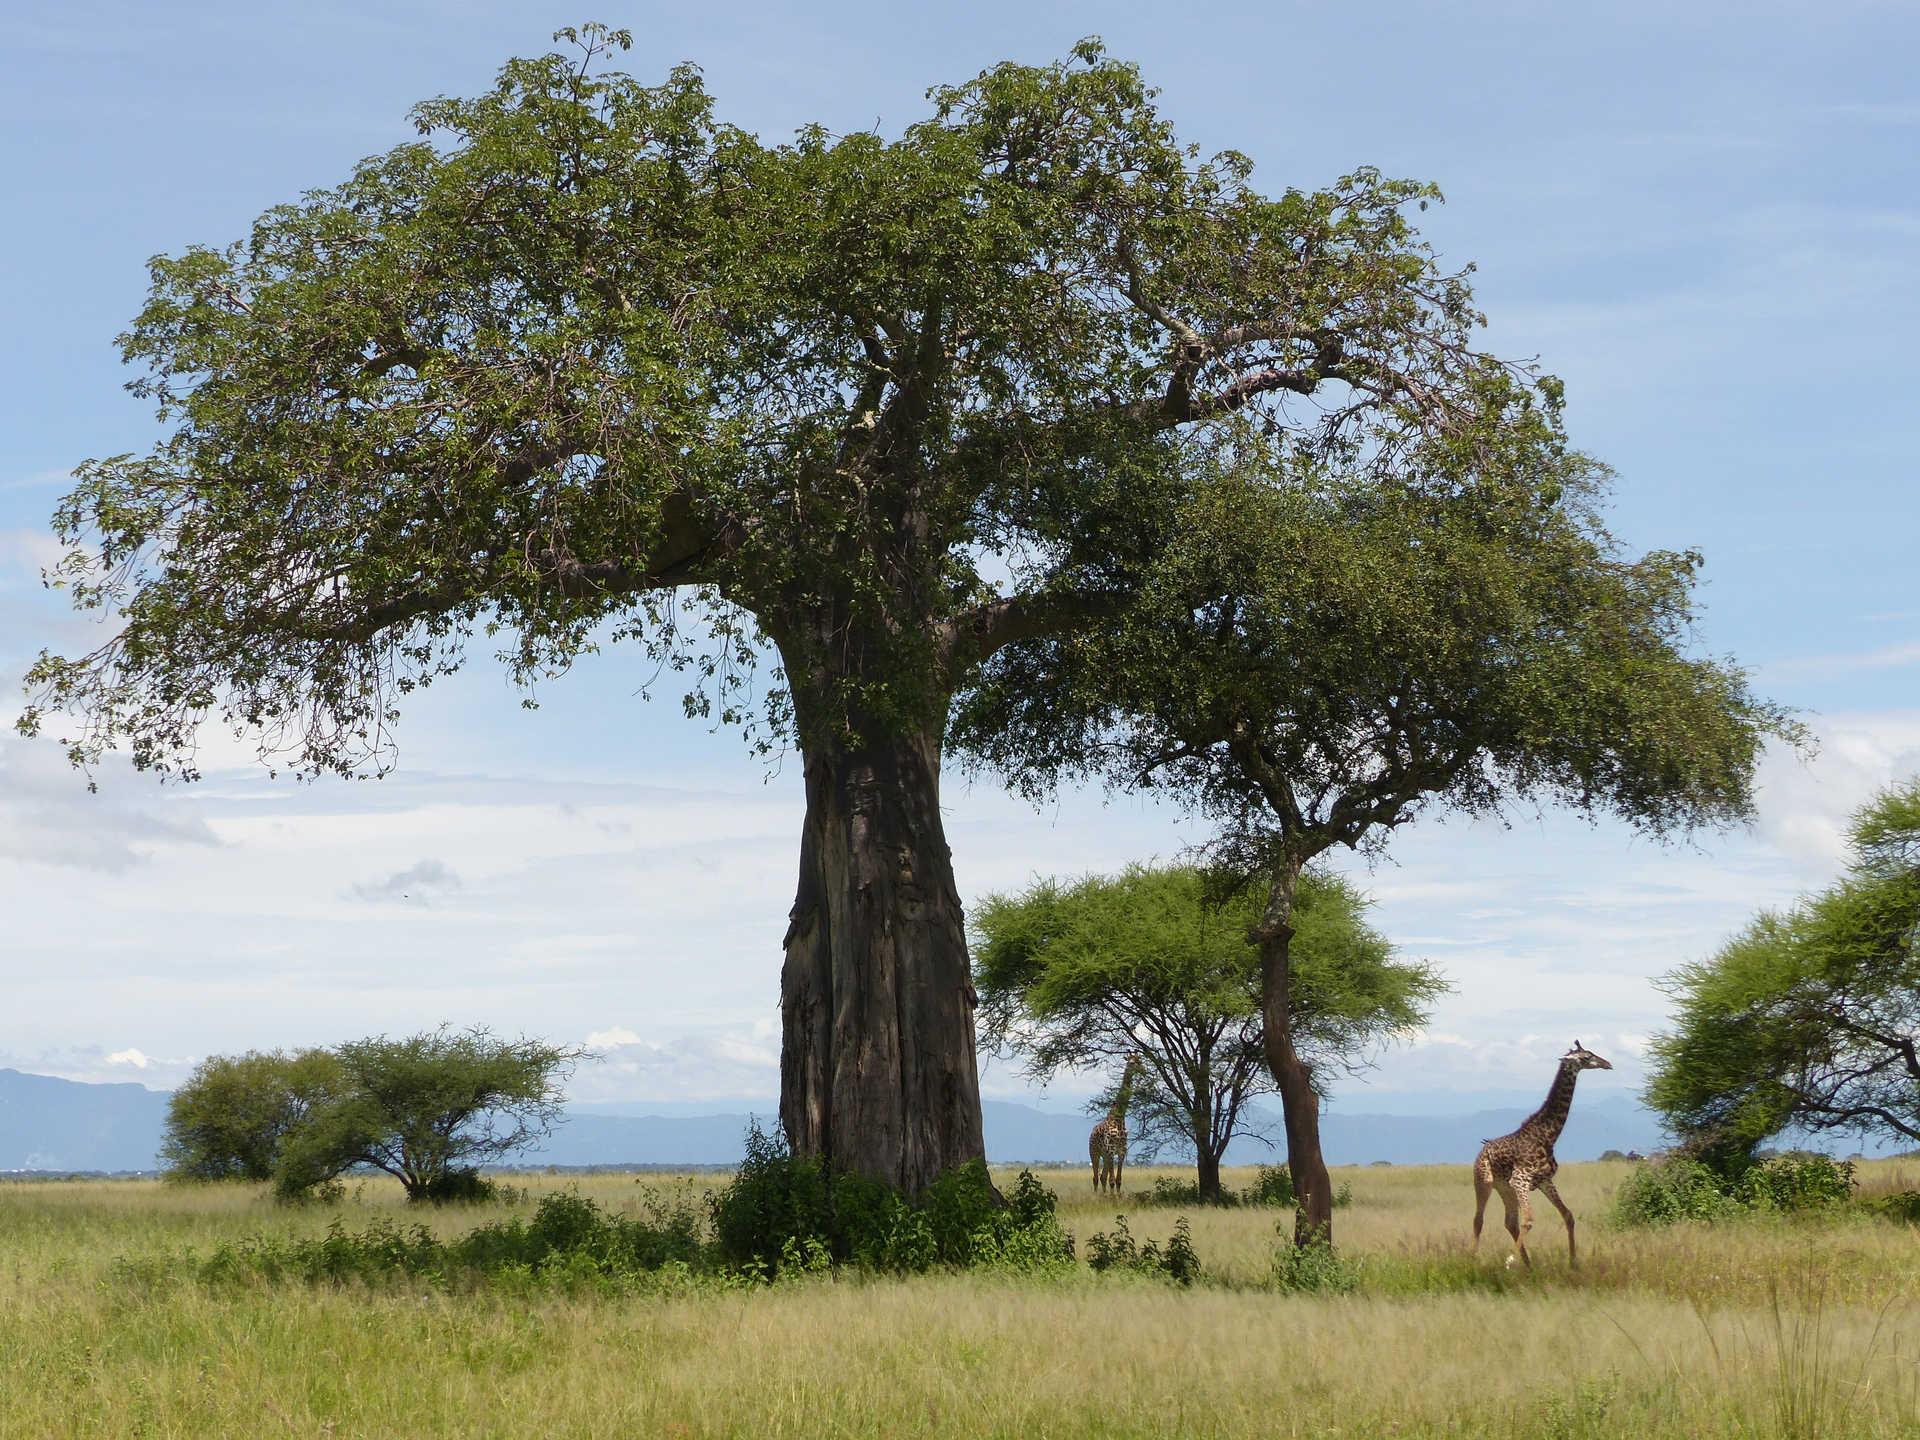 Giraffes in the Serengeti National Park